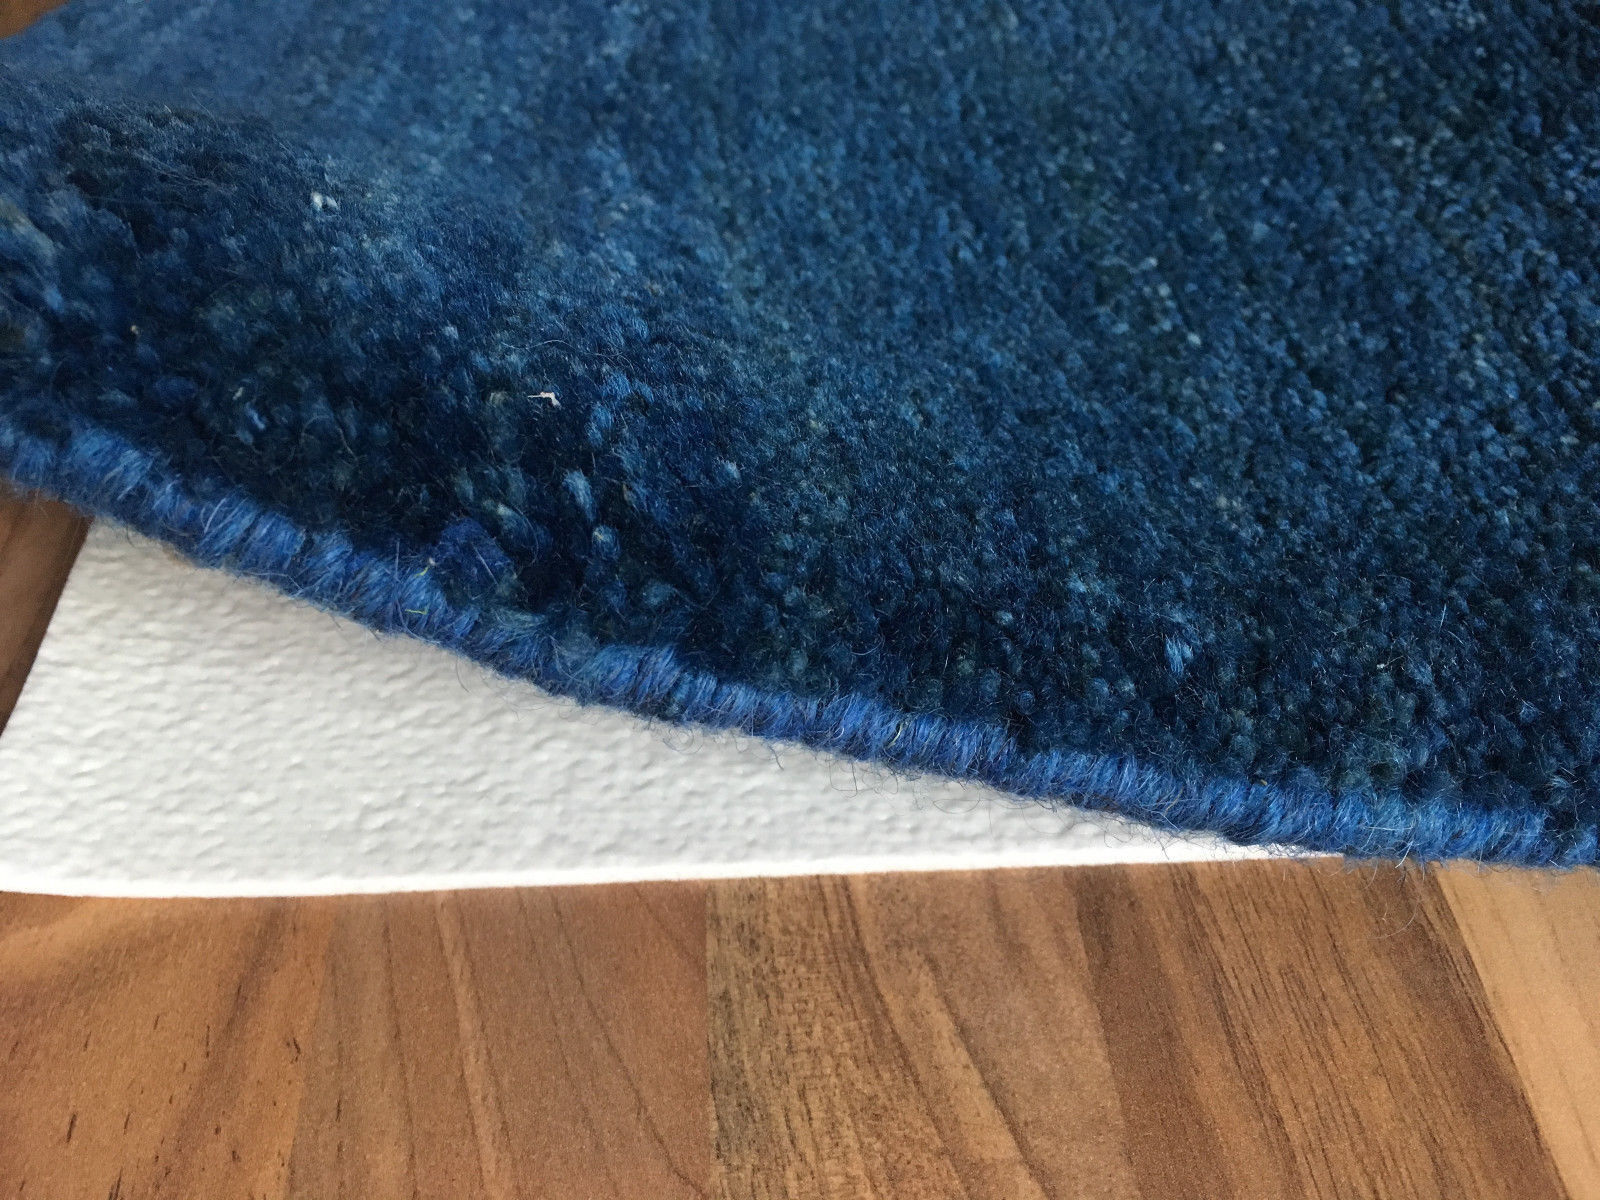 TAPPETO Gleitschutz AKO elastic 2,5 dimensioni a partire da 80 x 150 cm per pavimenti lisci